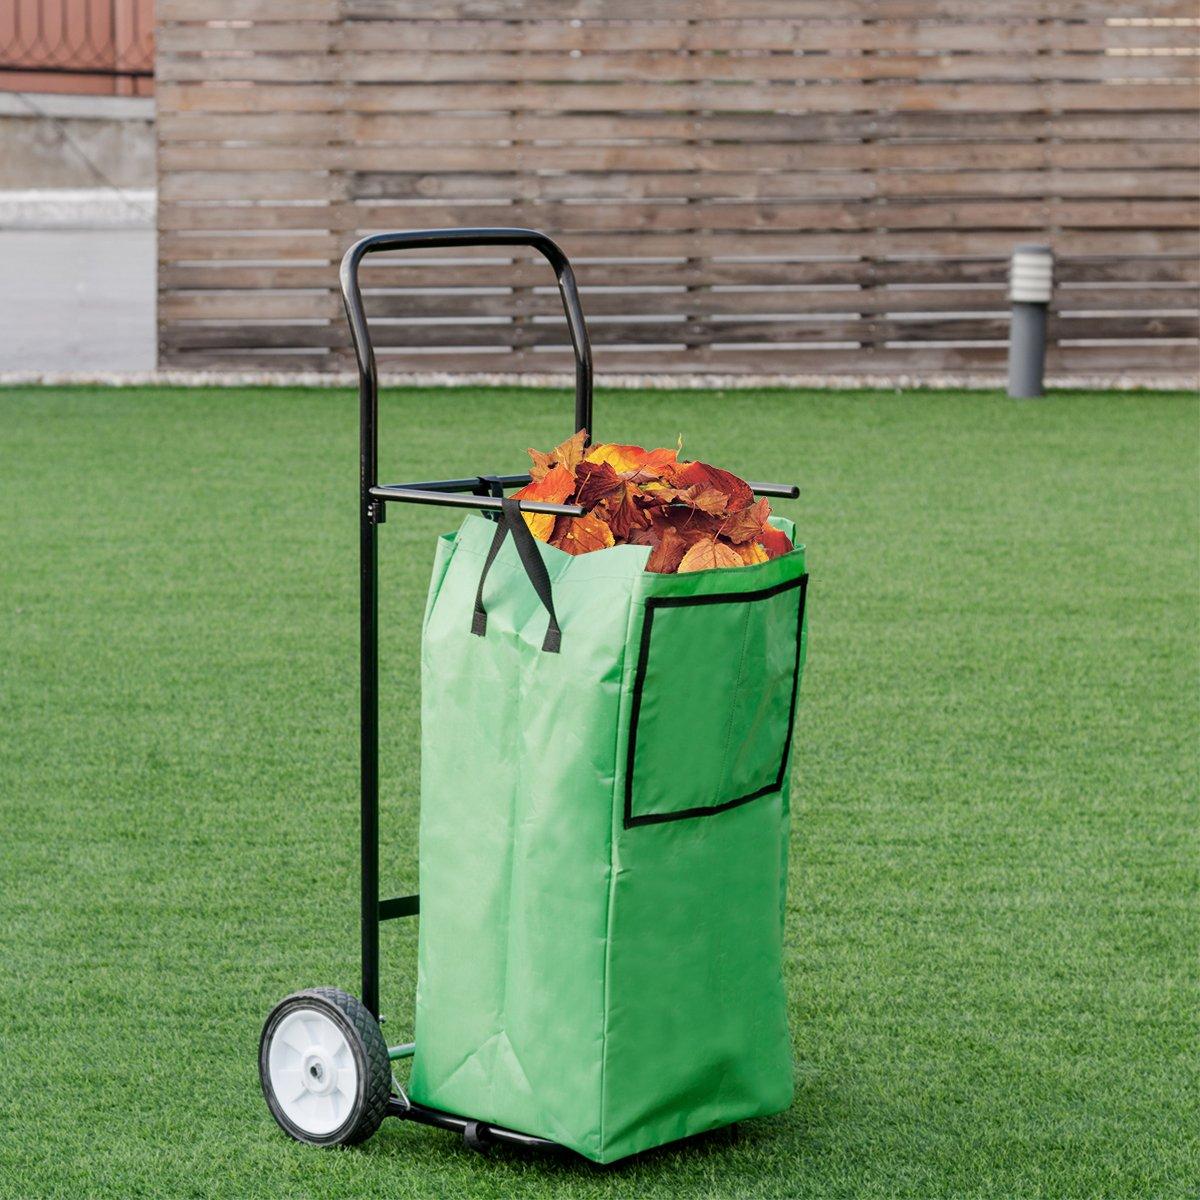 Goplus Portable Gardening Lawn Leaf Bag Detachable Tote Cart Multifunctional Folding Basket w/ Pocket Green by Goplus (Image #2)